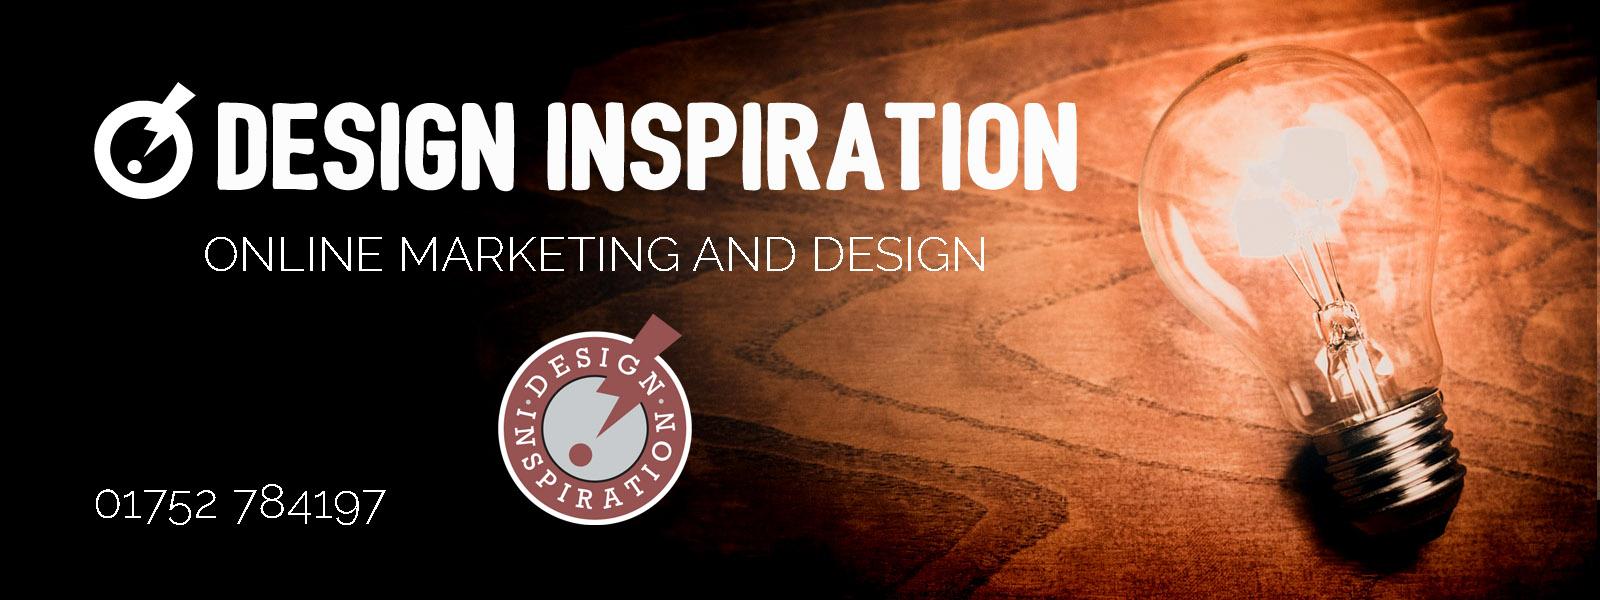 Digital Marketing by Design Inspiration